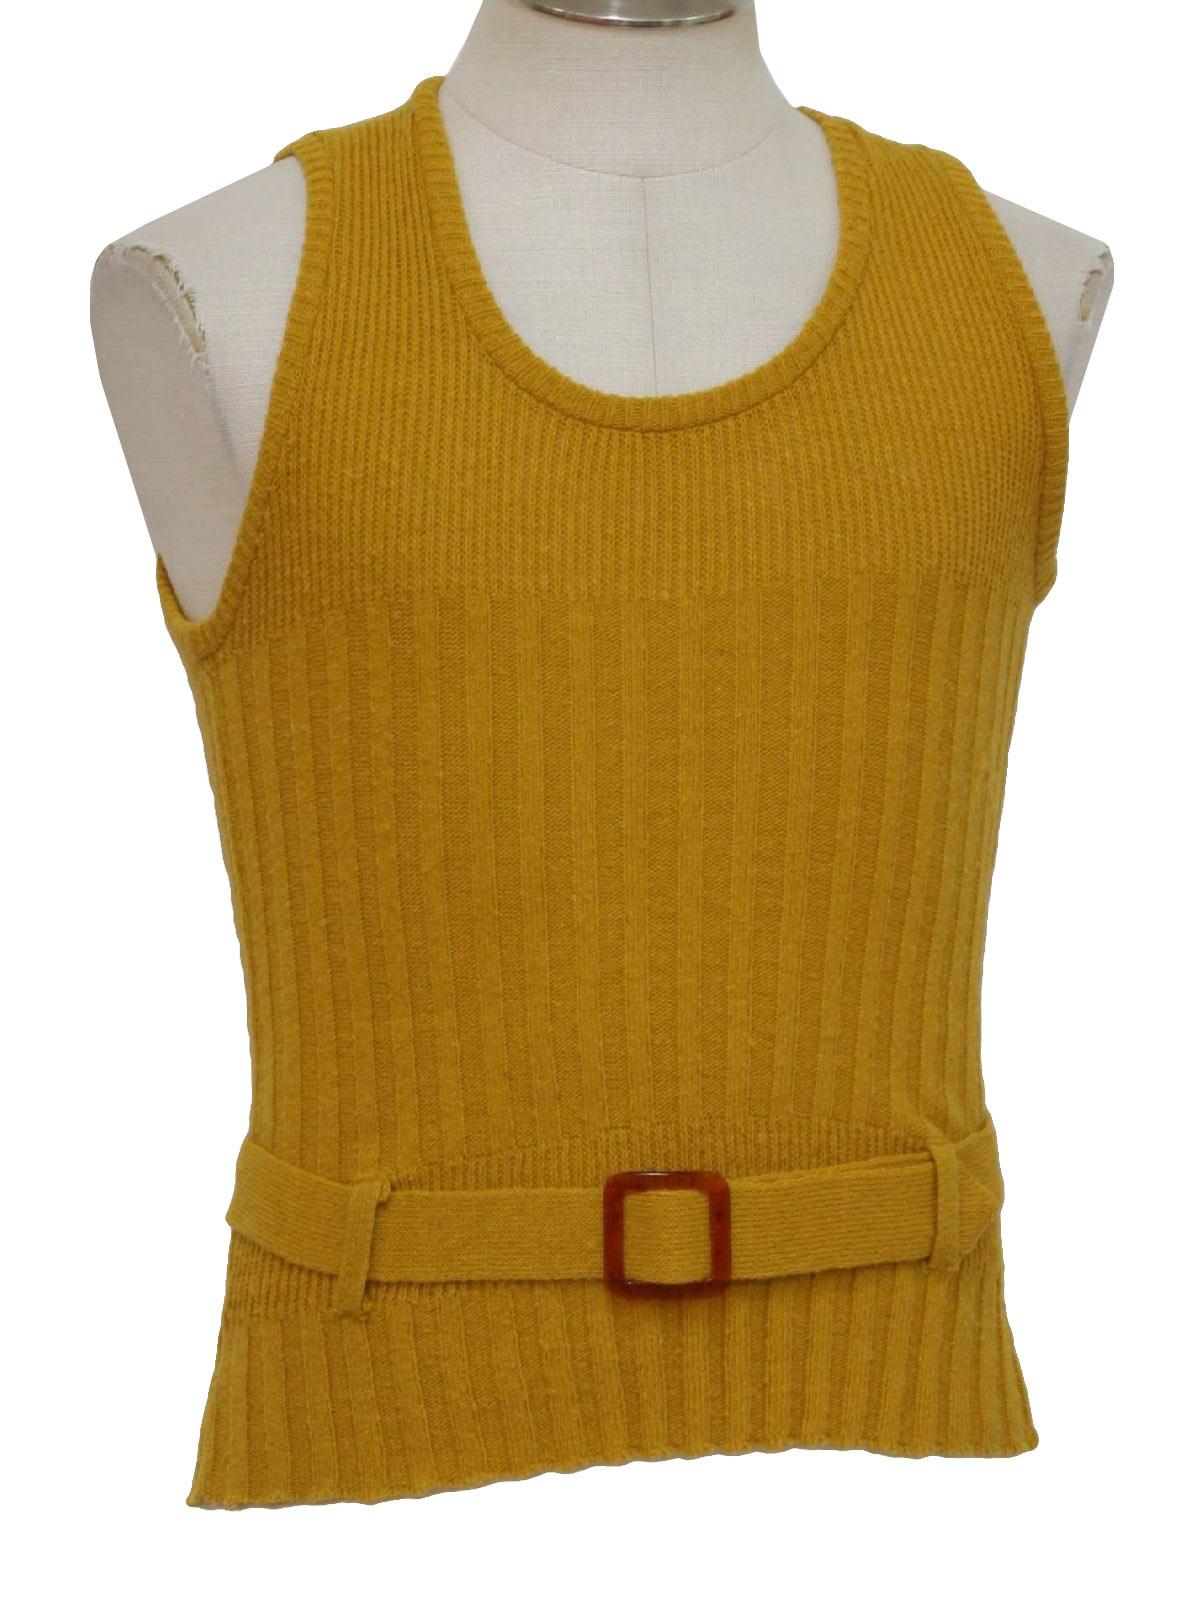 Vintage 60s Sweater: 60s -Brent Orlon Acrylic- Mens gold acrylic ...